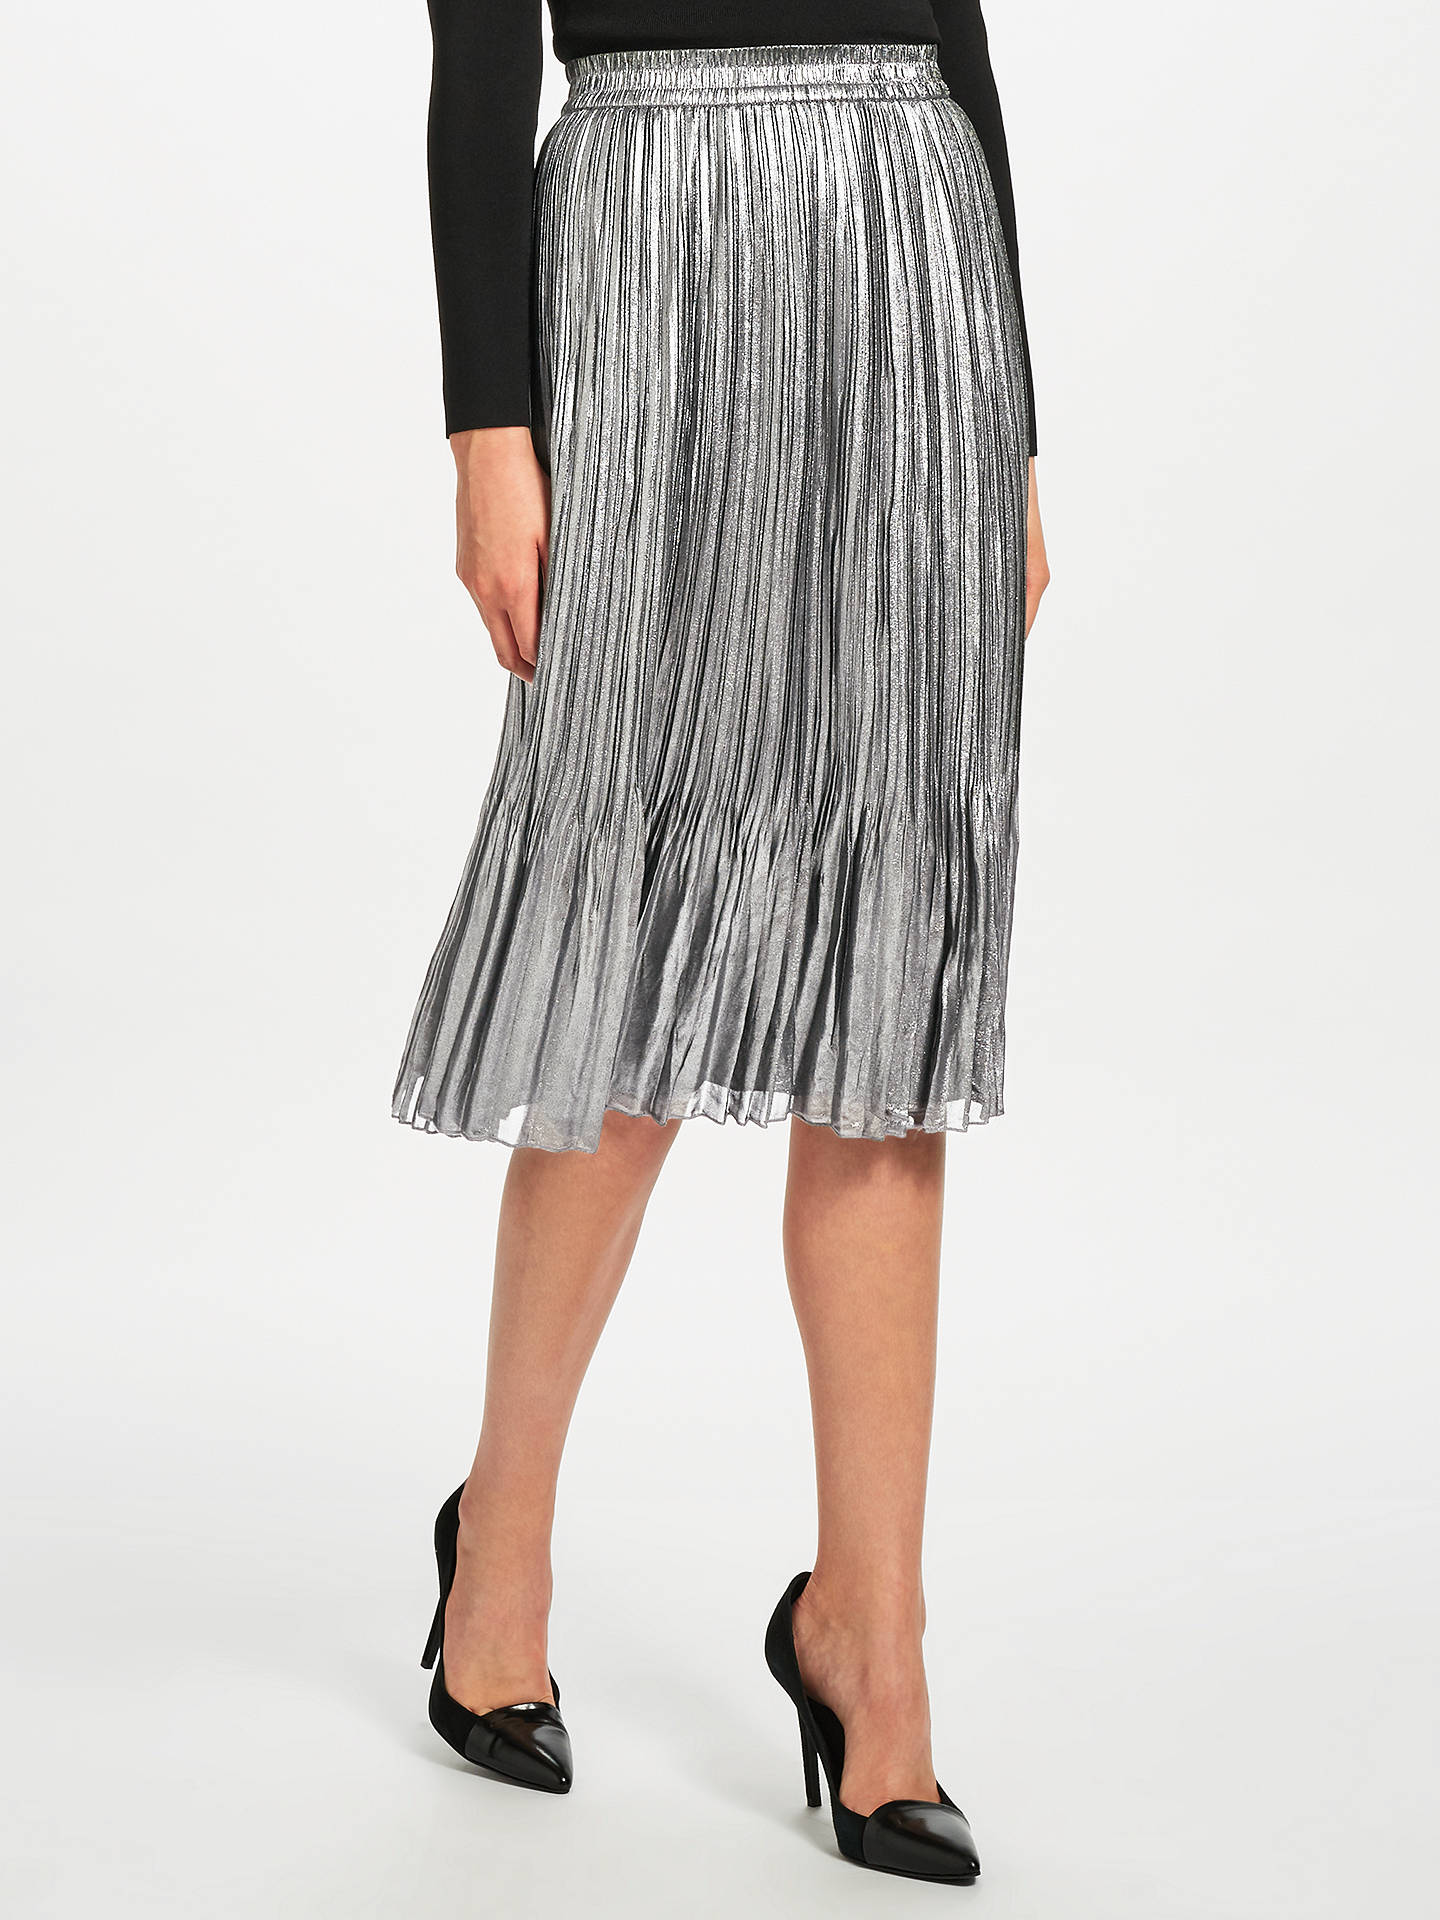 80586a7607 Buy Maison Scotch Metallic Pleated Midi Skirt, Silver, XS Online at  johnlewis.com ...